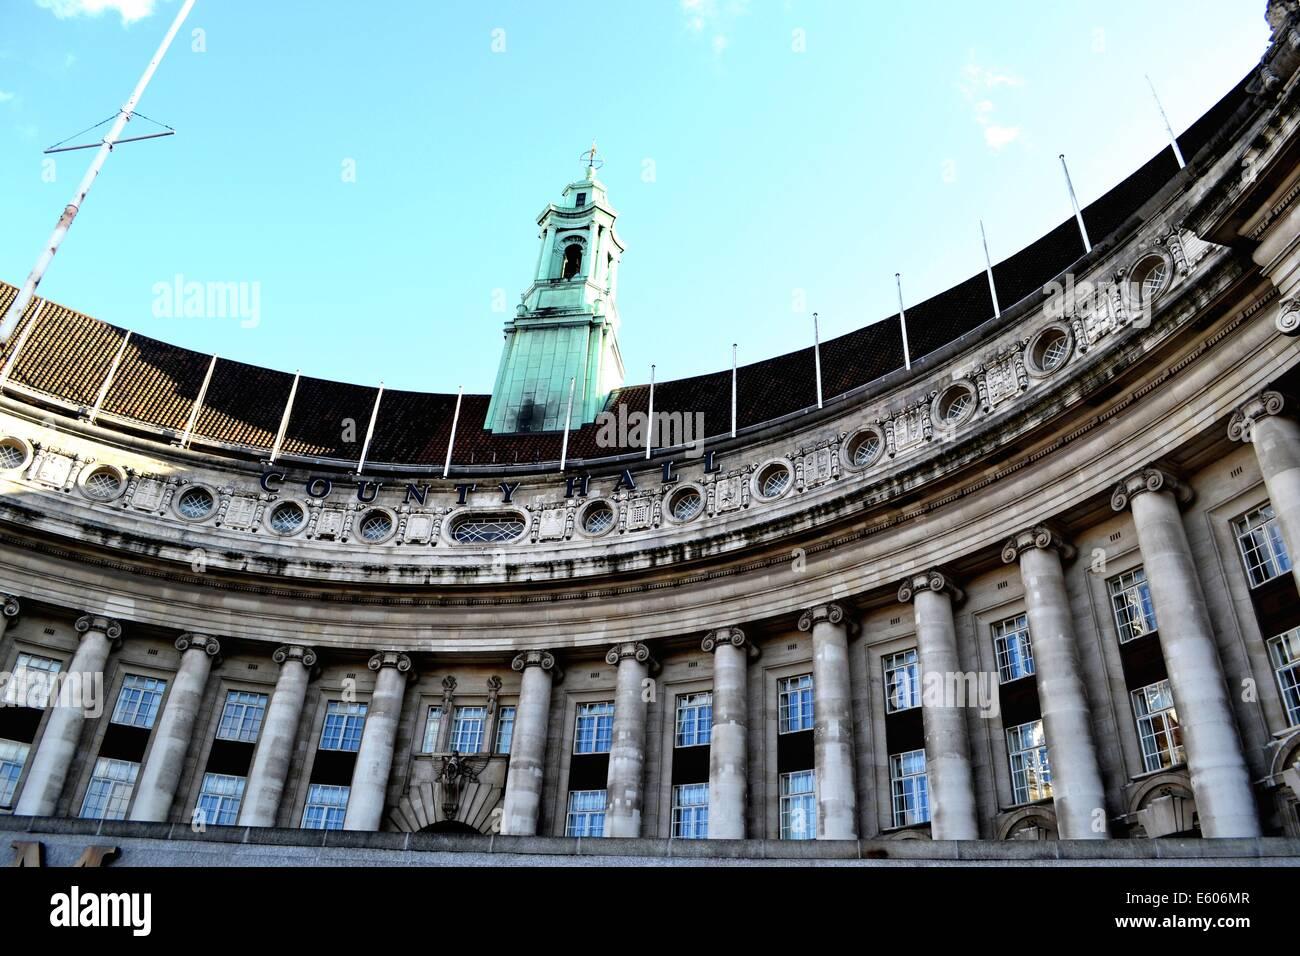 GLC Building - City Hall in London, United Kingdom - Stock Image